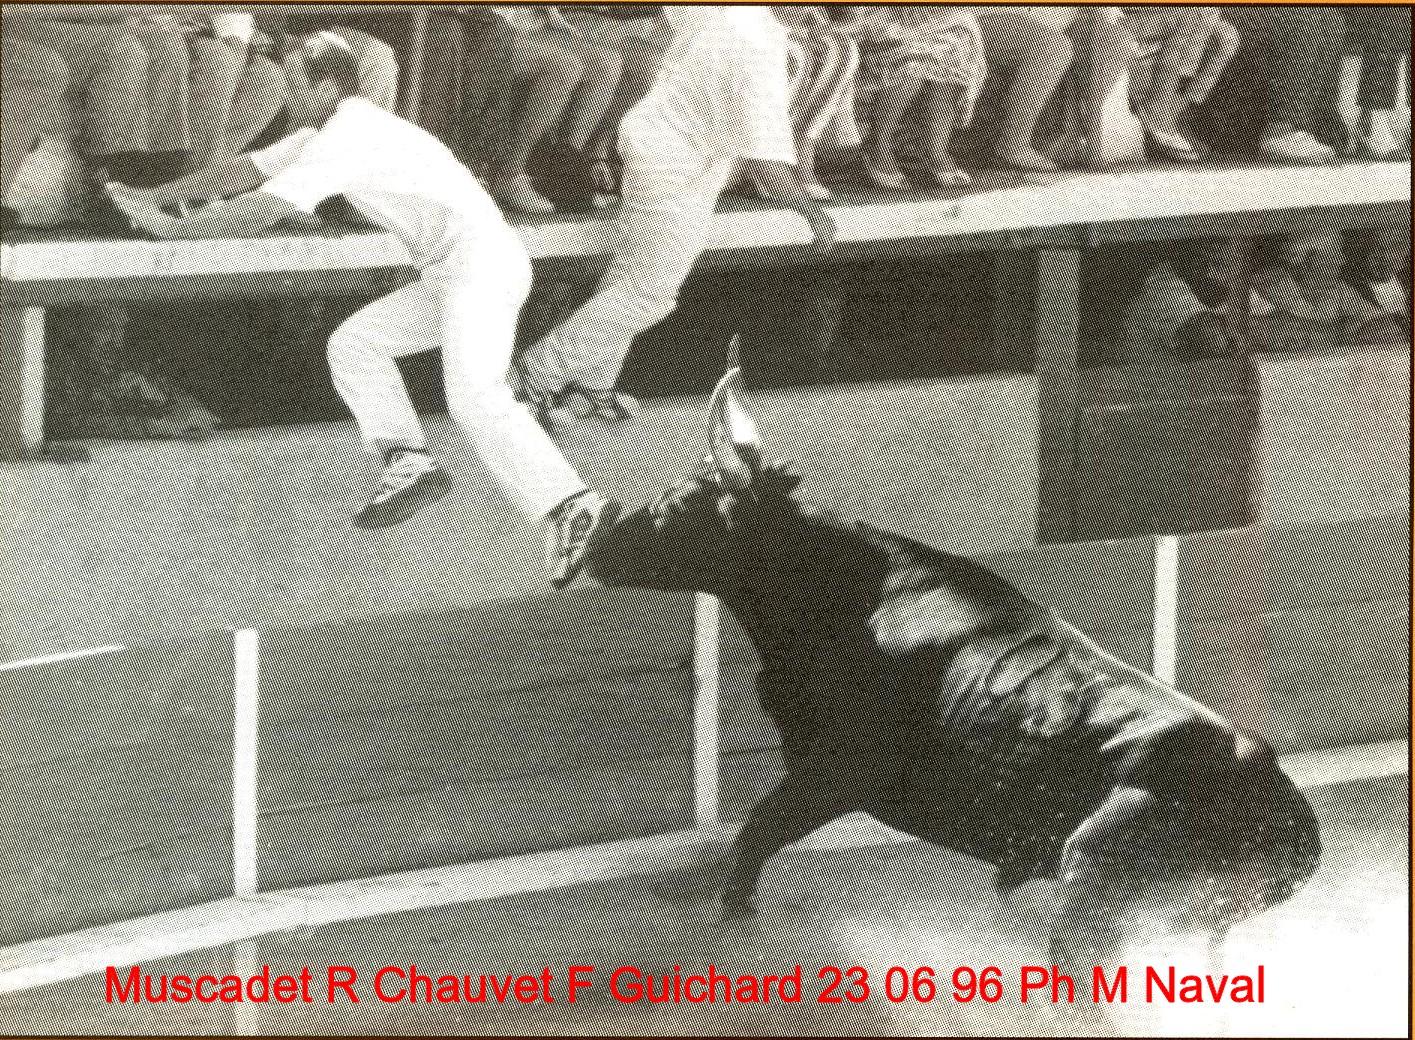 Muscadet r chauvet f guichard 23 06 1996